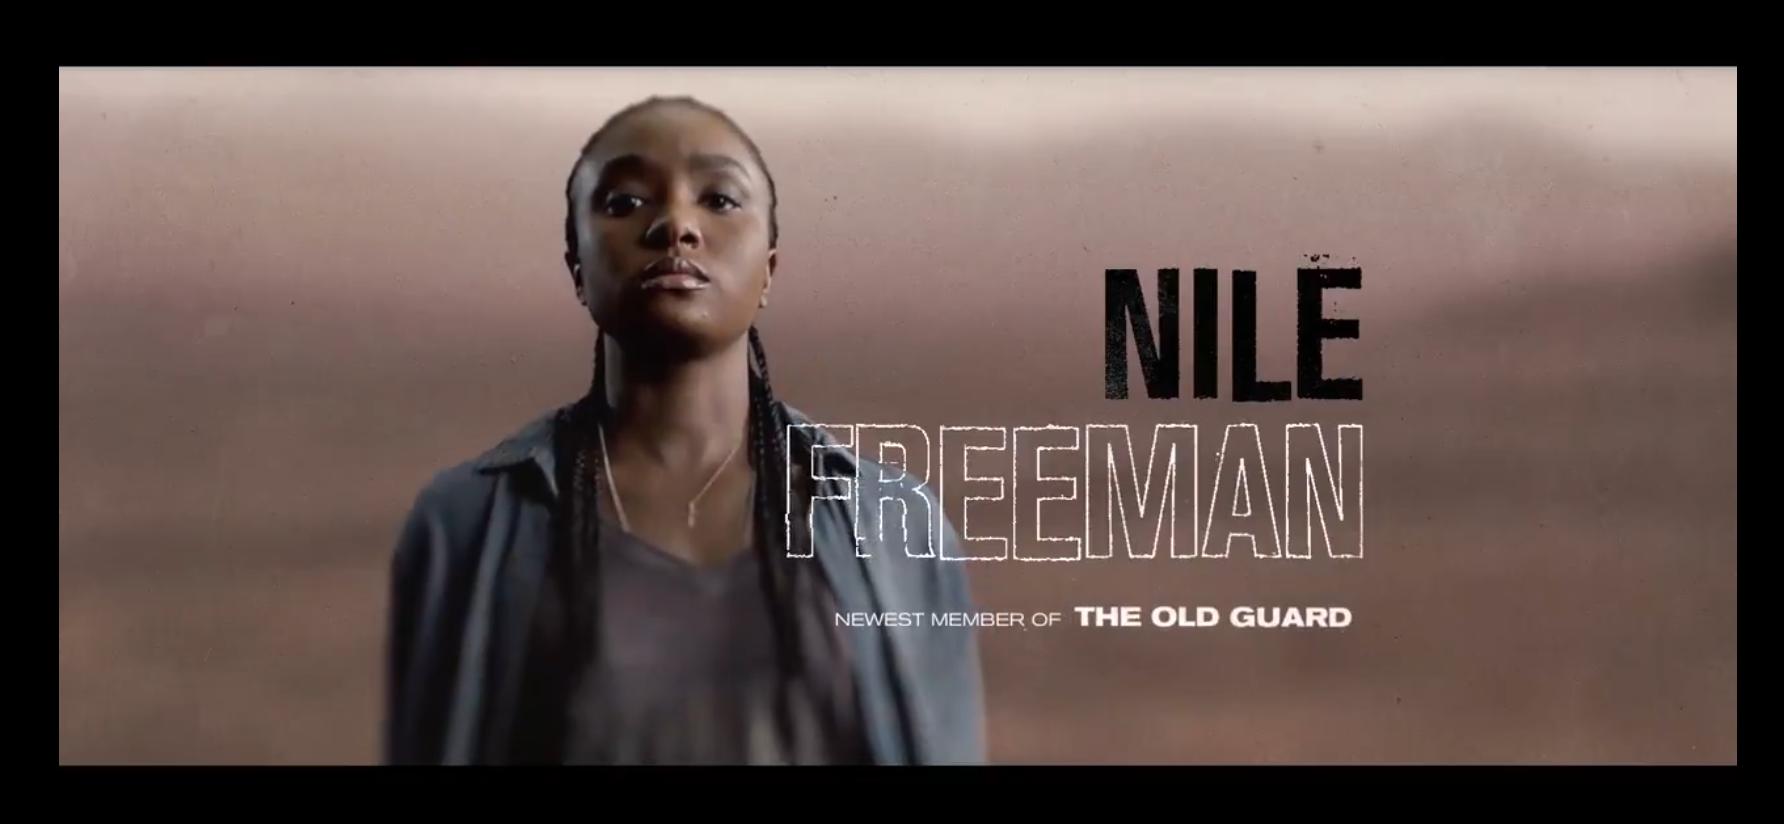 Nile Freeman